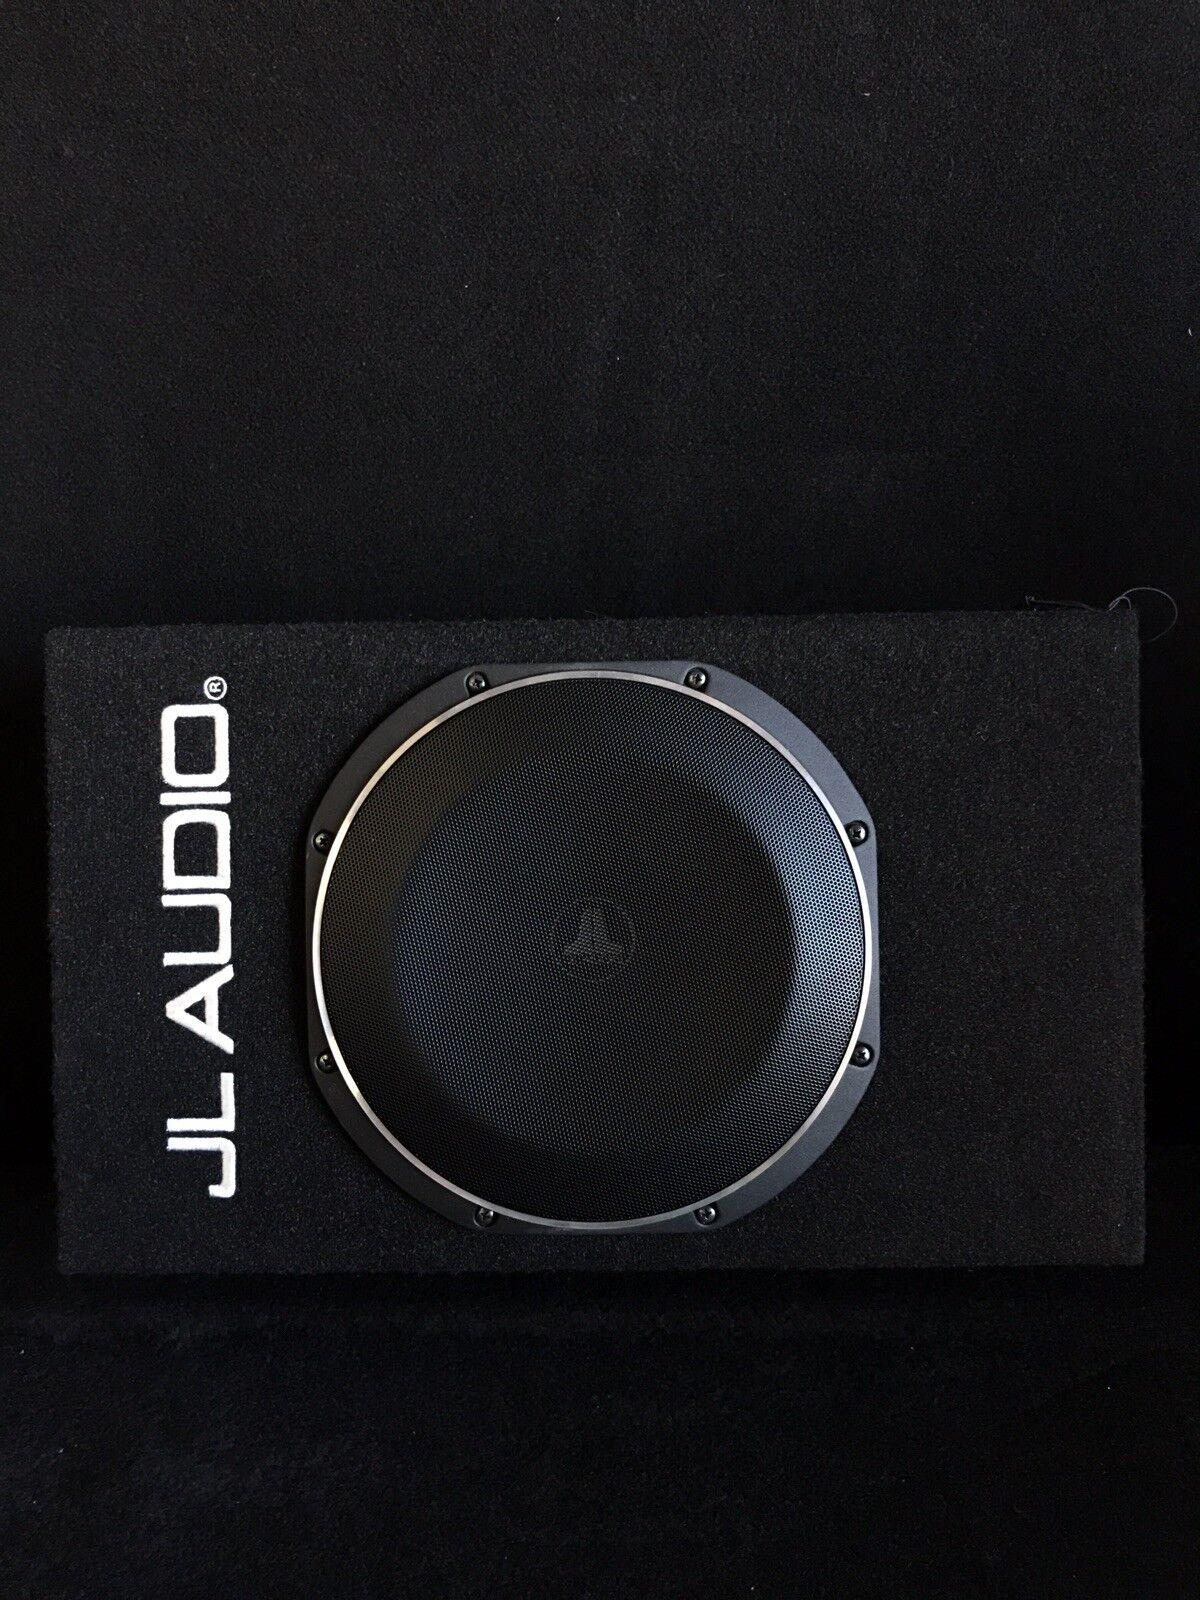 JL Audio ACS110LG-TW1 Powered Shallow Subwoofer Sealed 10TW1 PowerWedge Sub Box